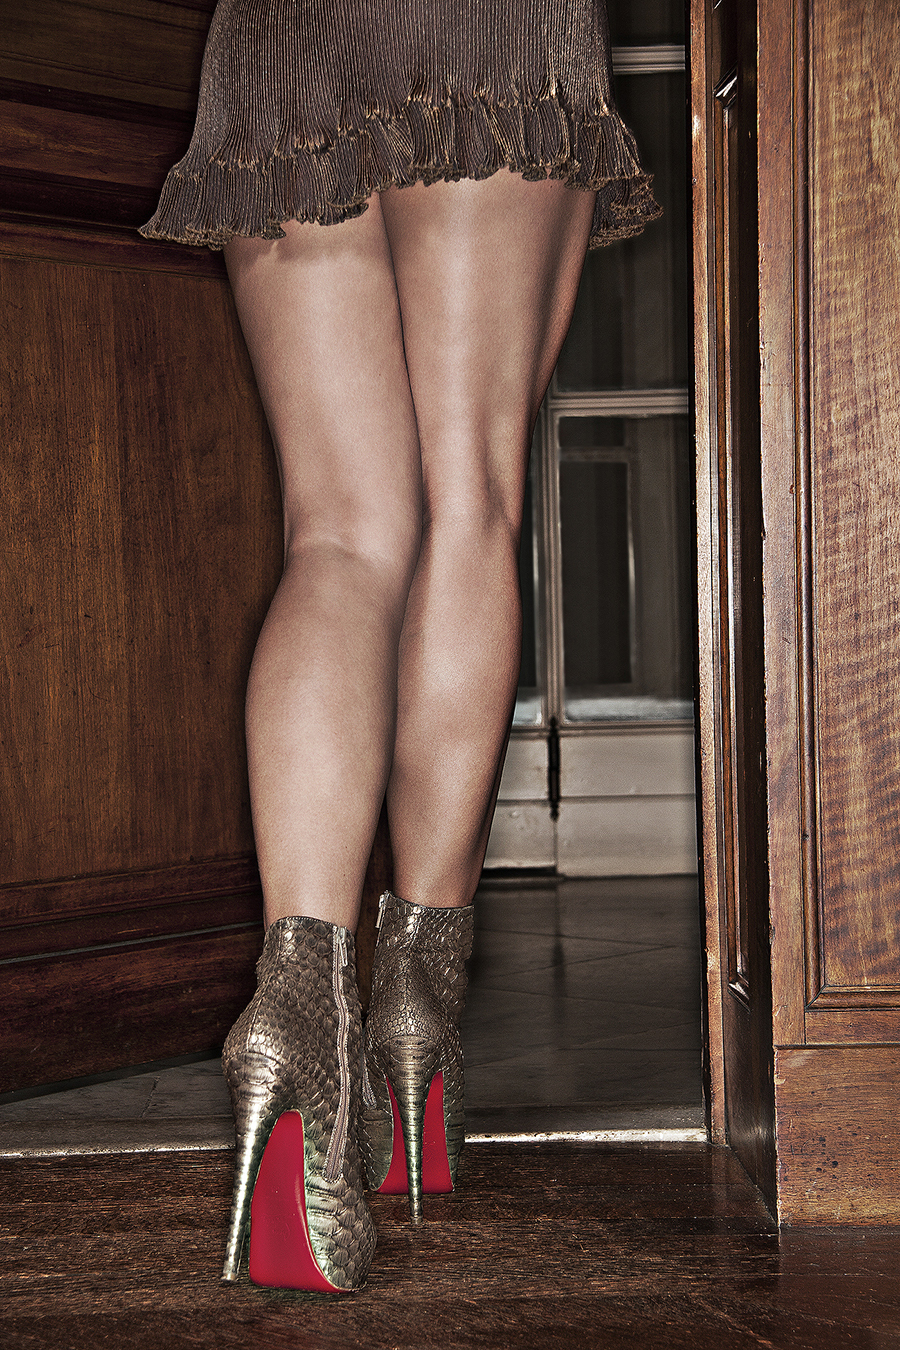 Tony_Ward_fashion_photography_magazine_legs_German_Cosmopolitan_model_Carmelita_martell_Louboutin_heels